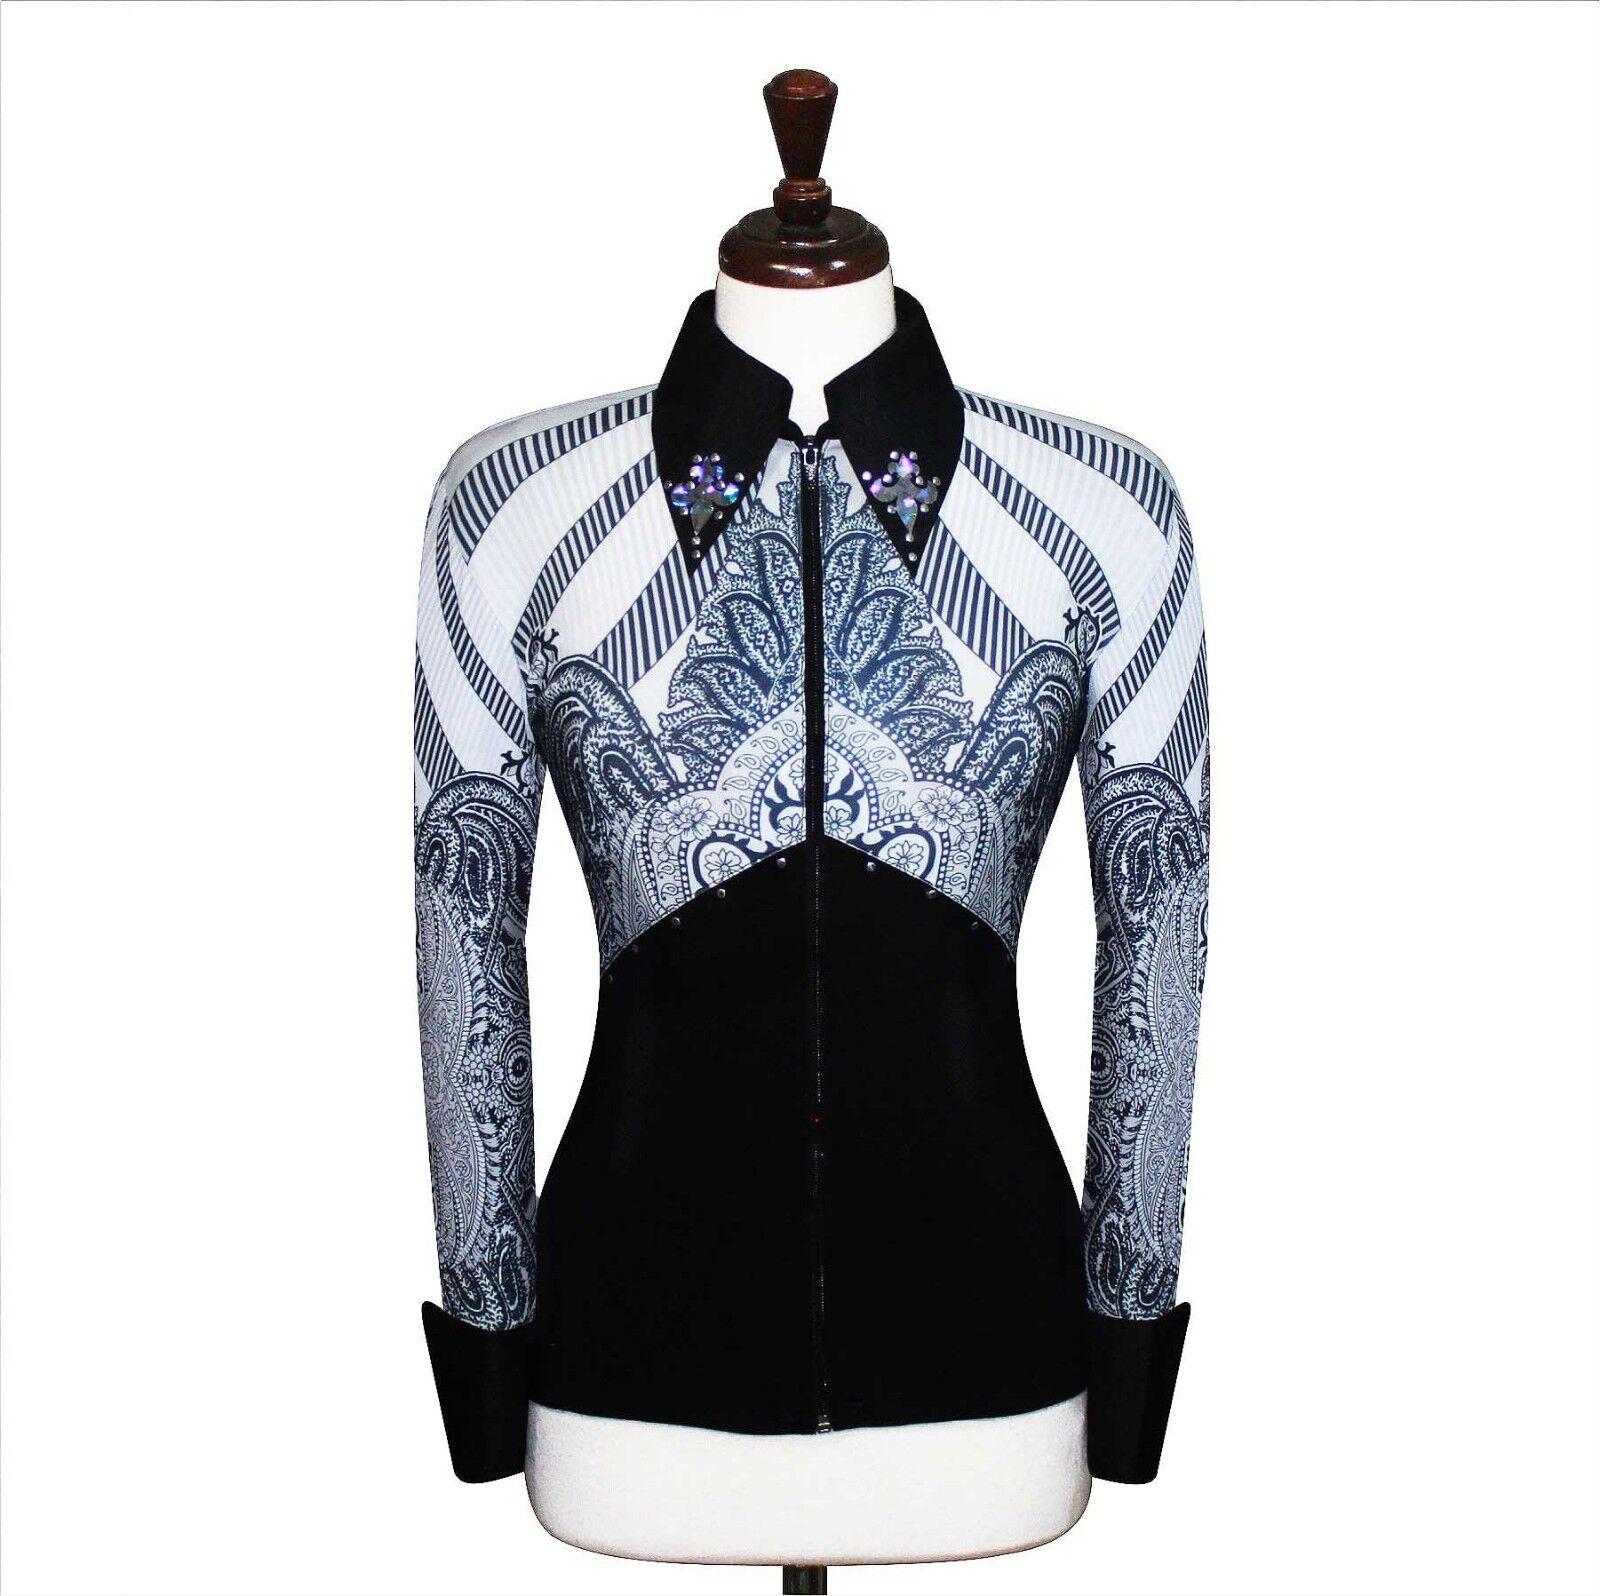 XL Western alardes Pleasure Horsemanship show camisa chaqueta rodeo Queen